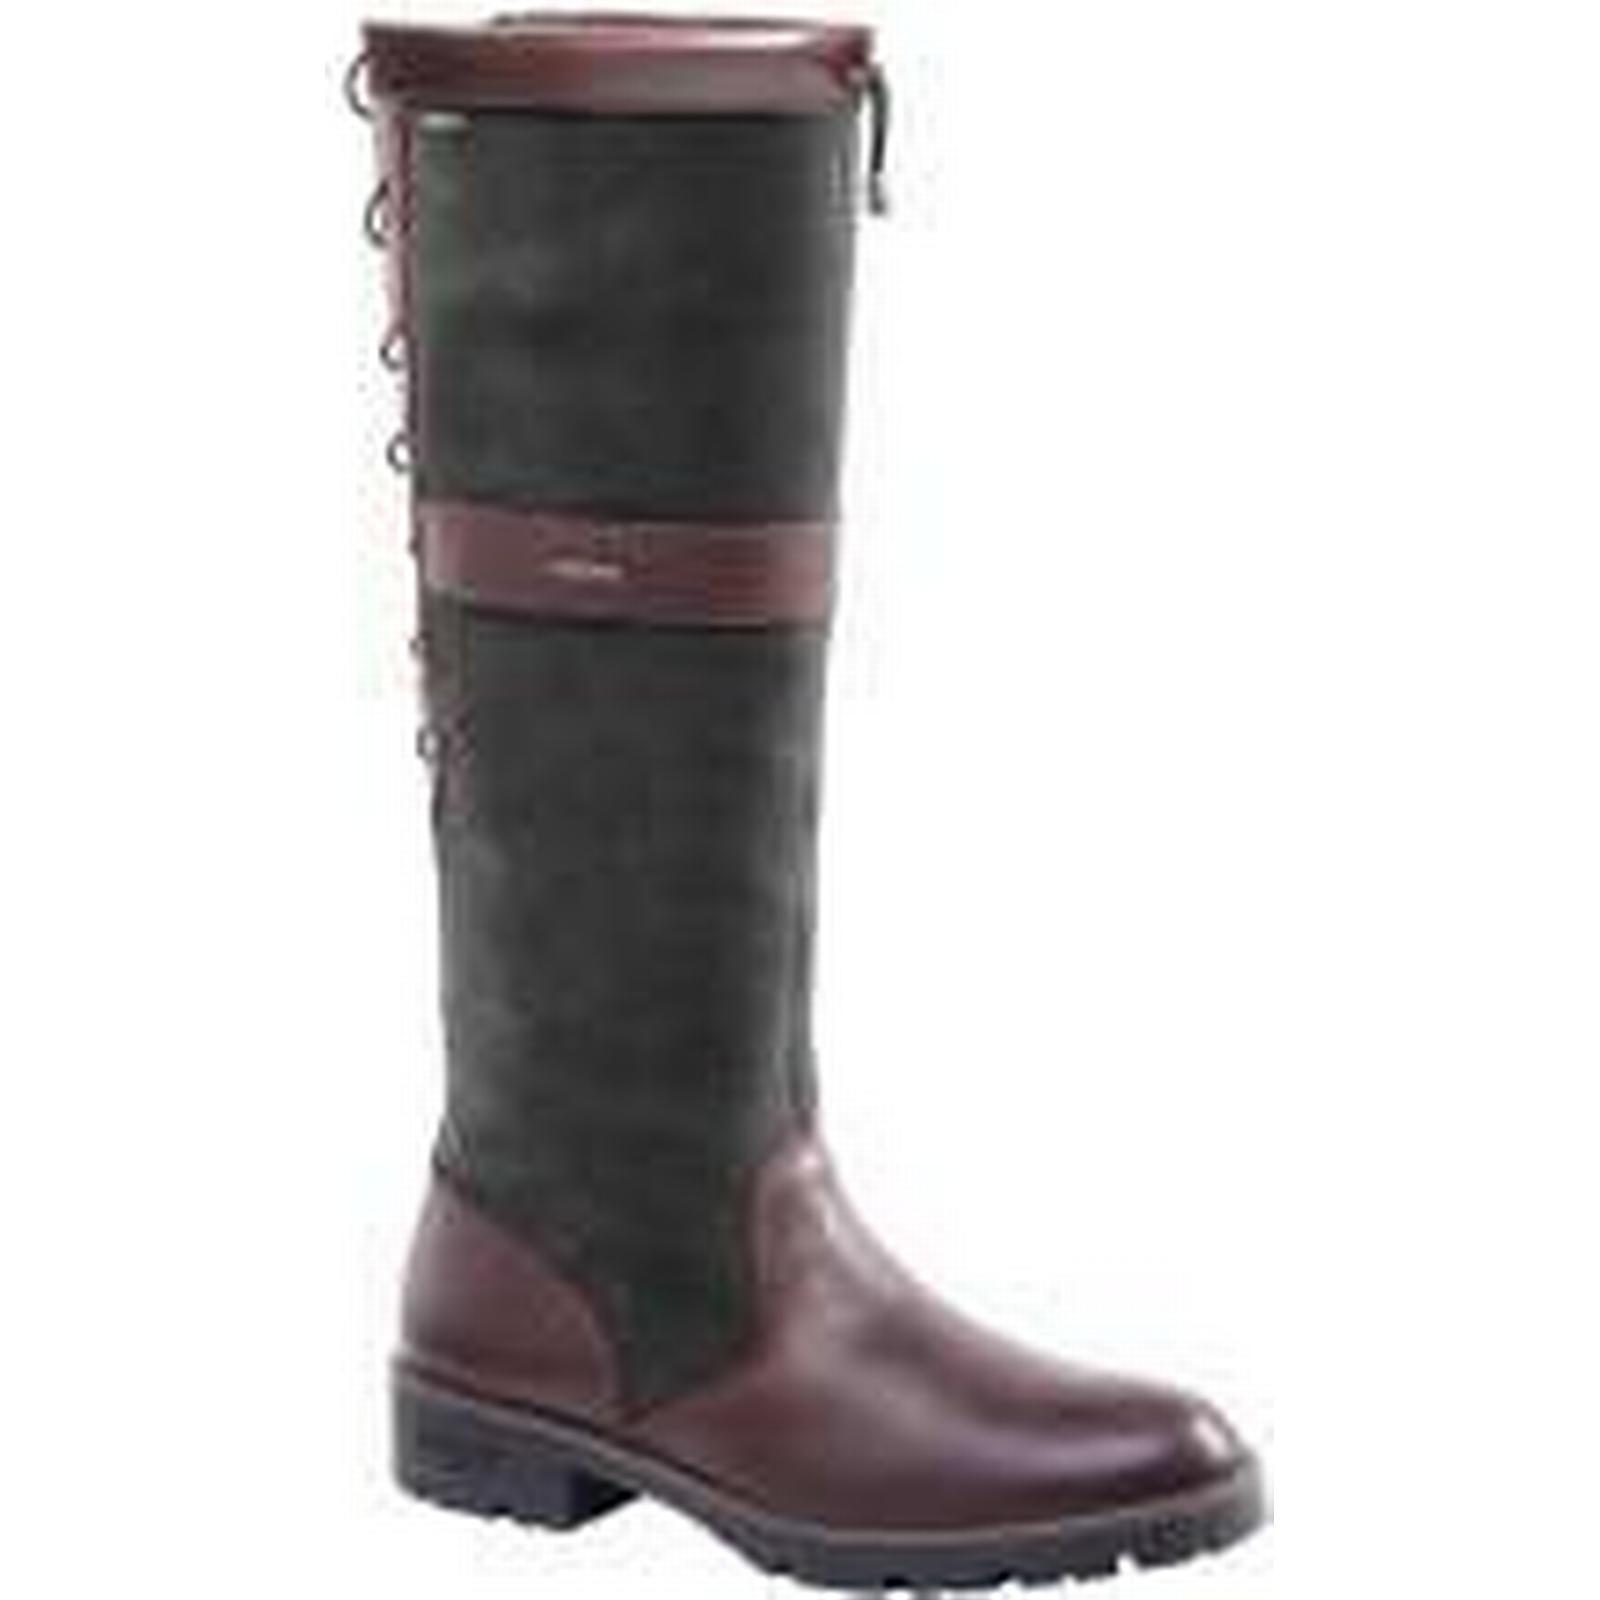 Dubarry Boots, Glanmire Boots, Dubarry Black/Brown, UK 7 (EU41) e82cd3